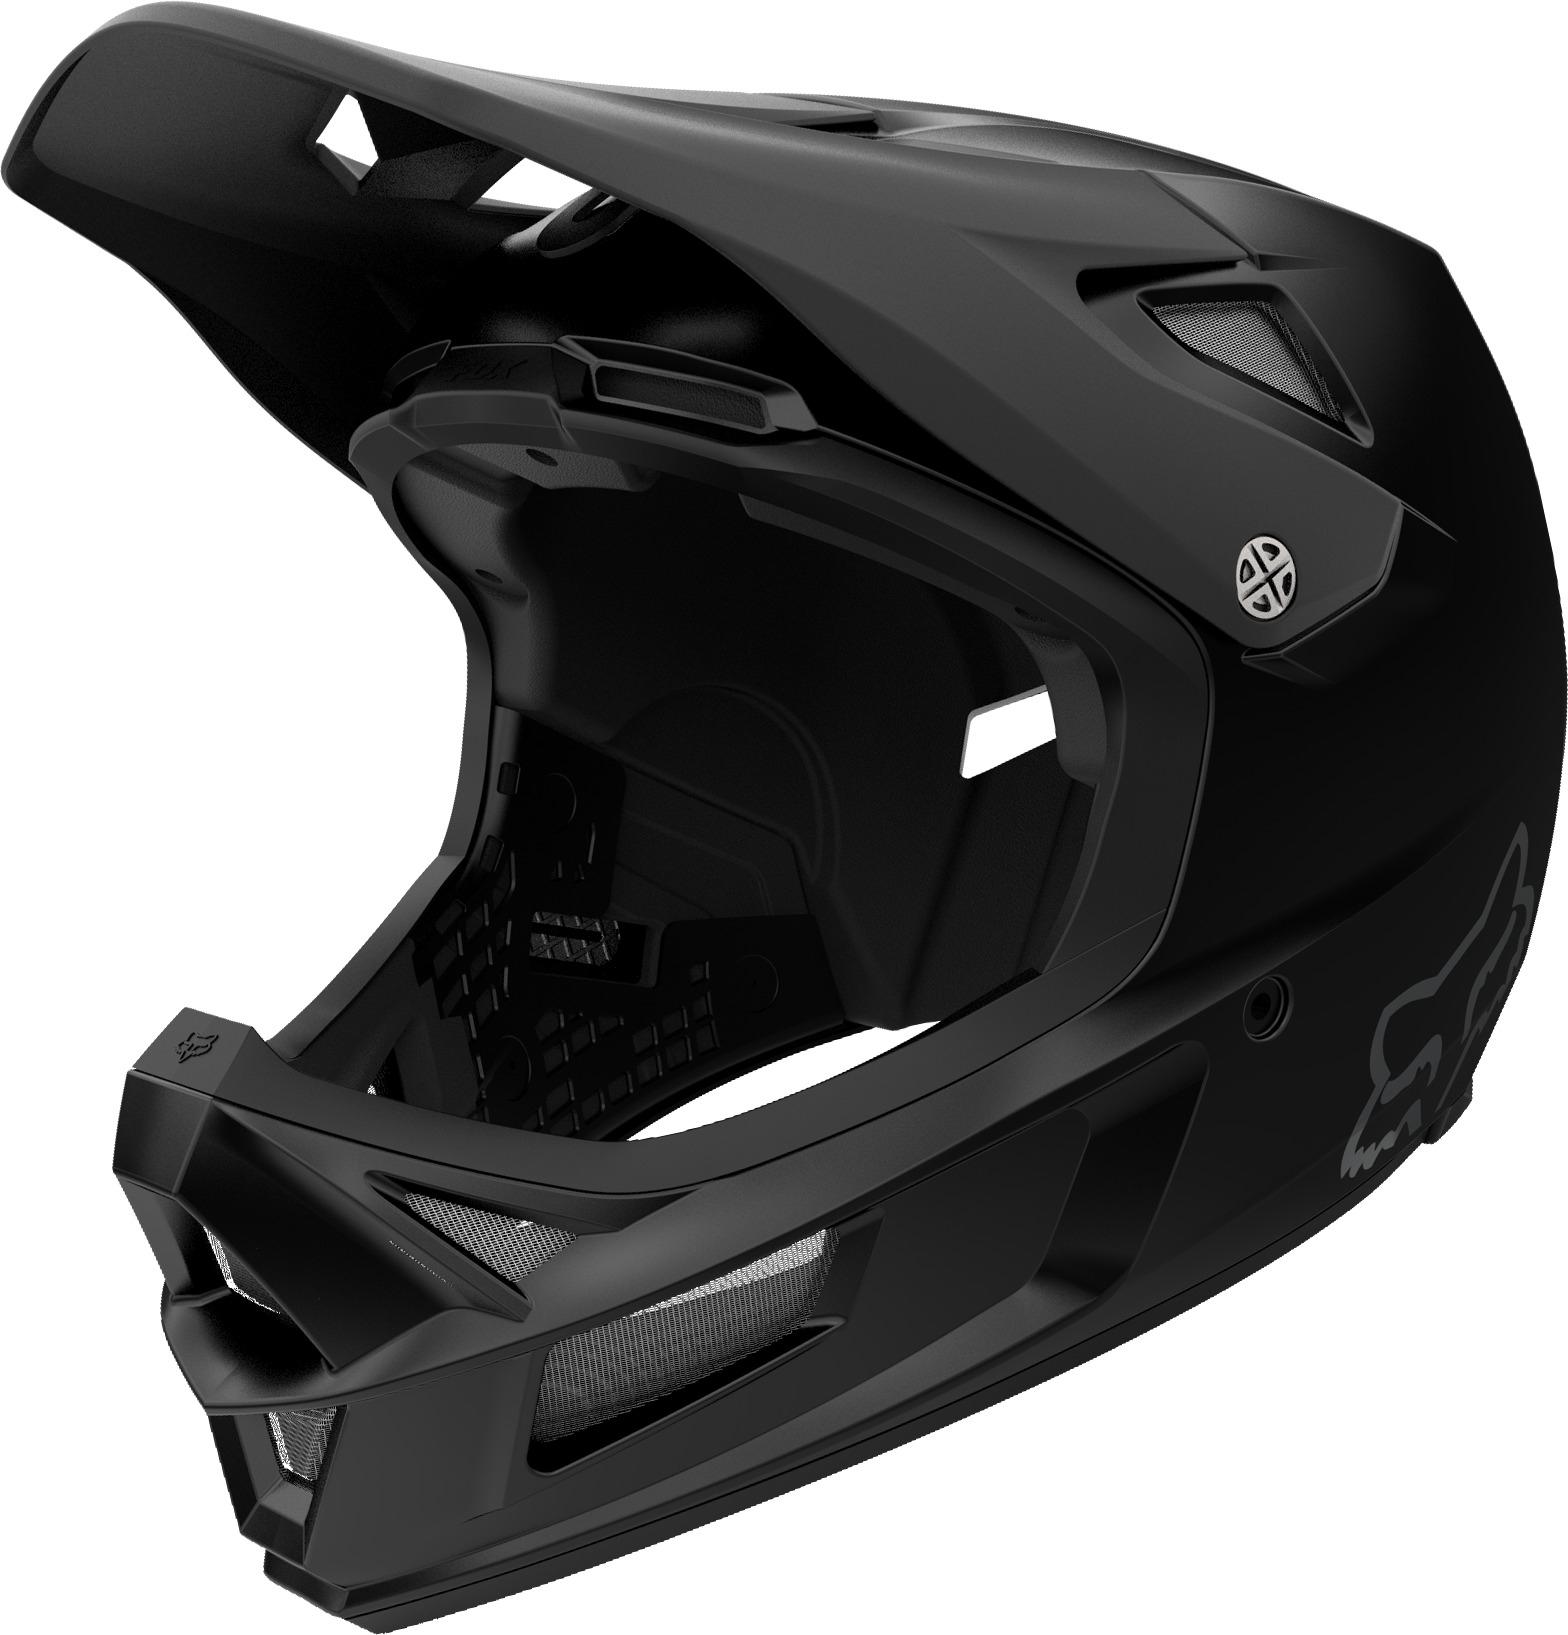 Fox Racing Rampage Comp MIPS - Fullface MTB-Helm - Schwarz - Größe S, M, L